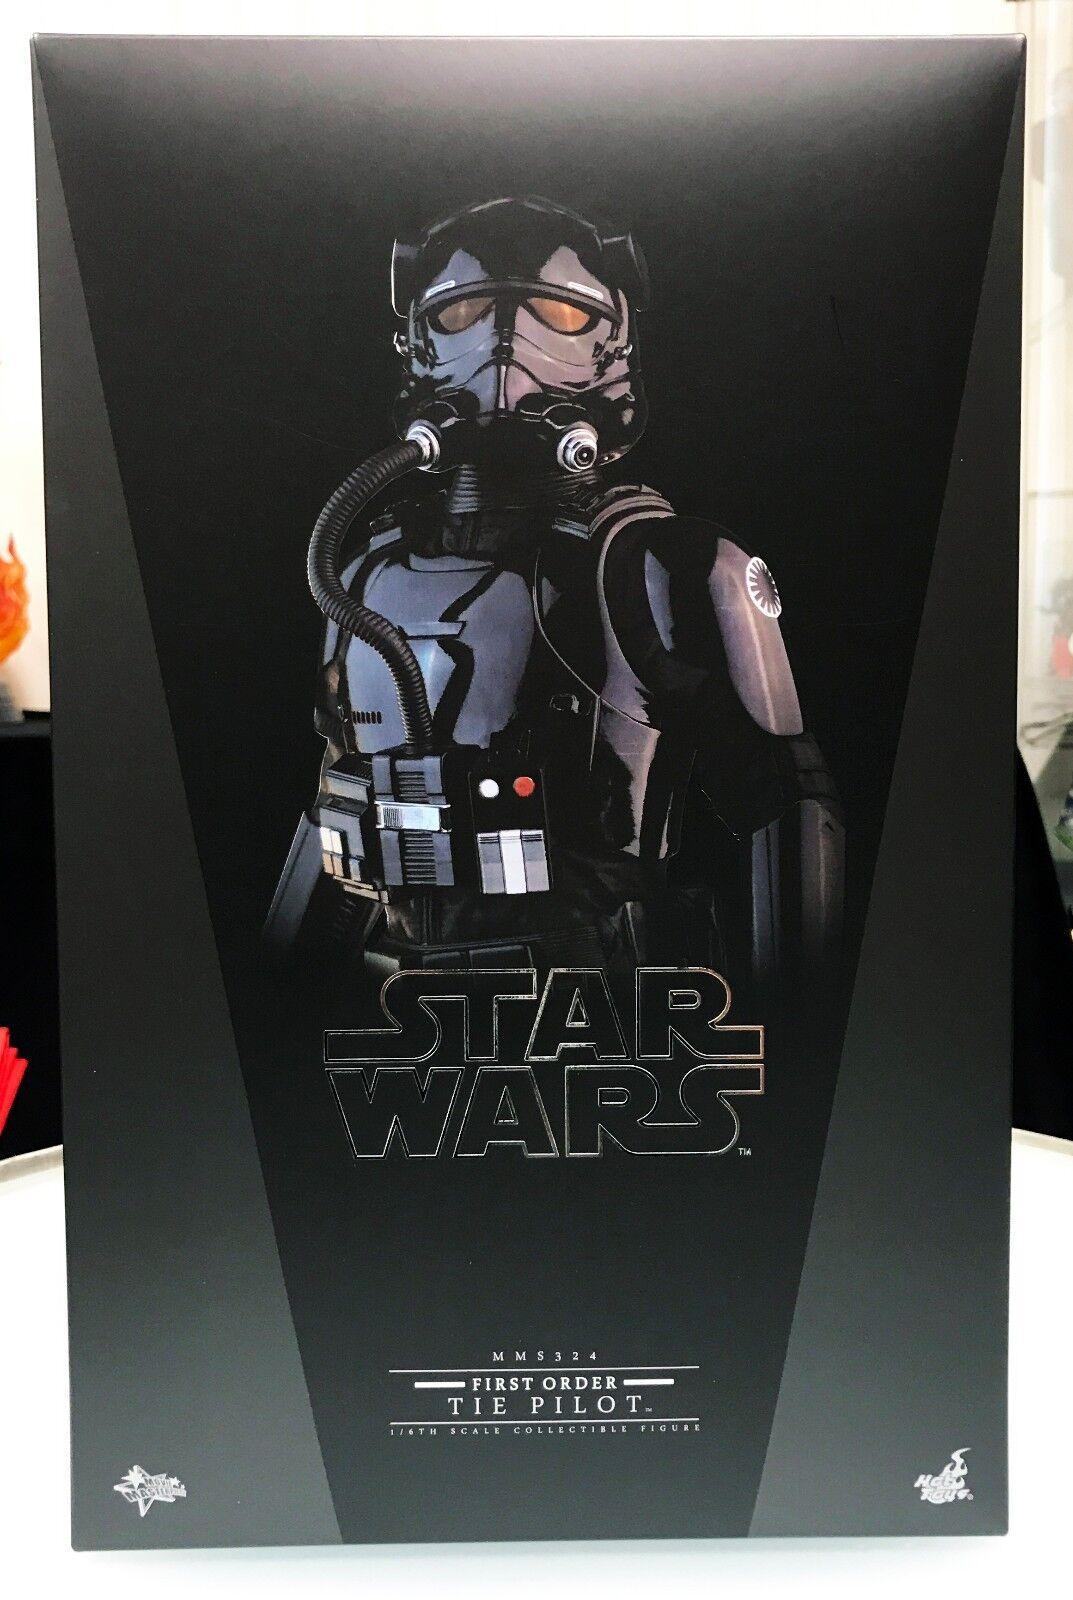 Hot Toys Star Wars 1 6 VII 7 Force Awakens First Order Tie Pilot Figure New MISB